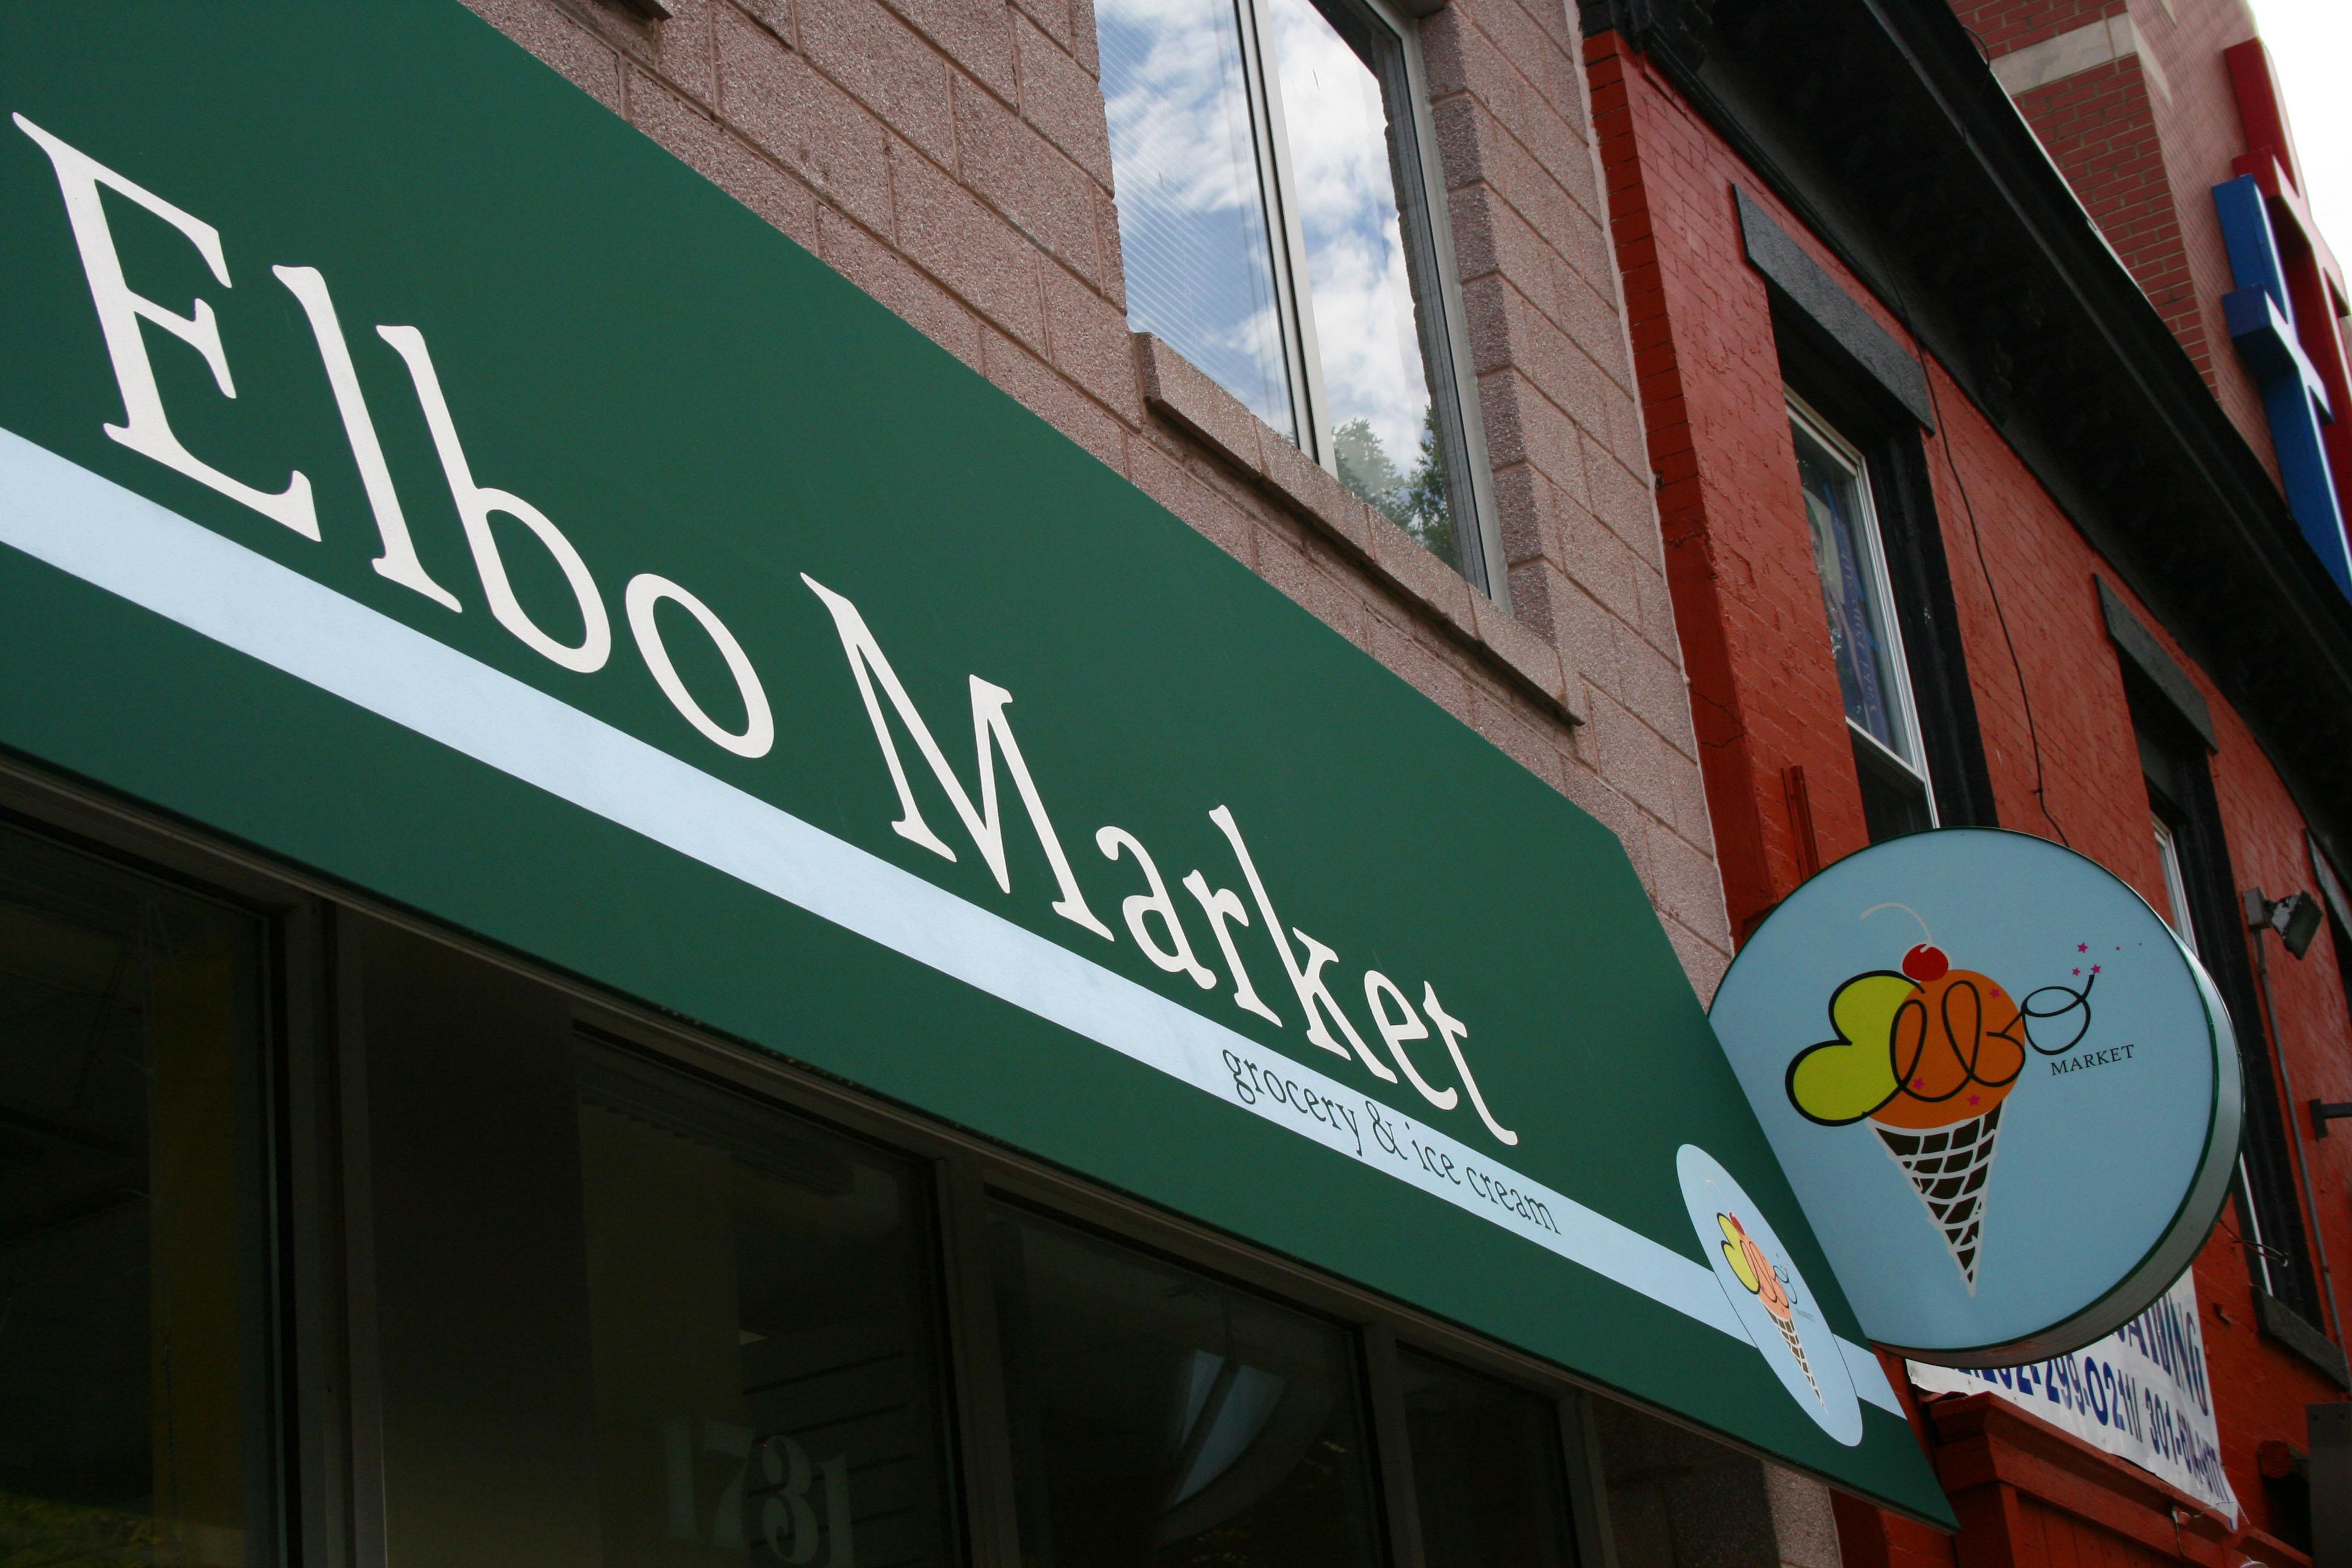 Elbo Market